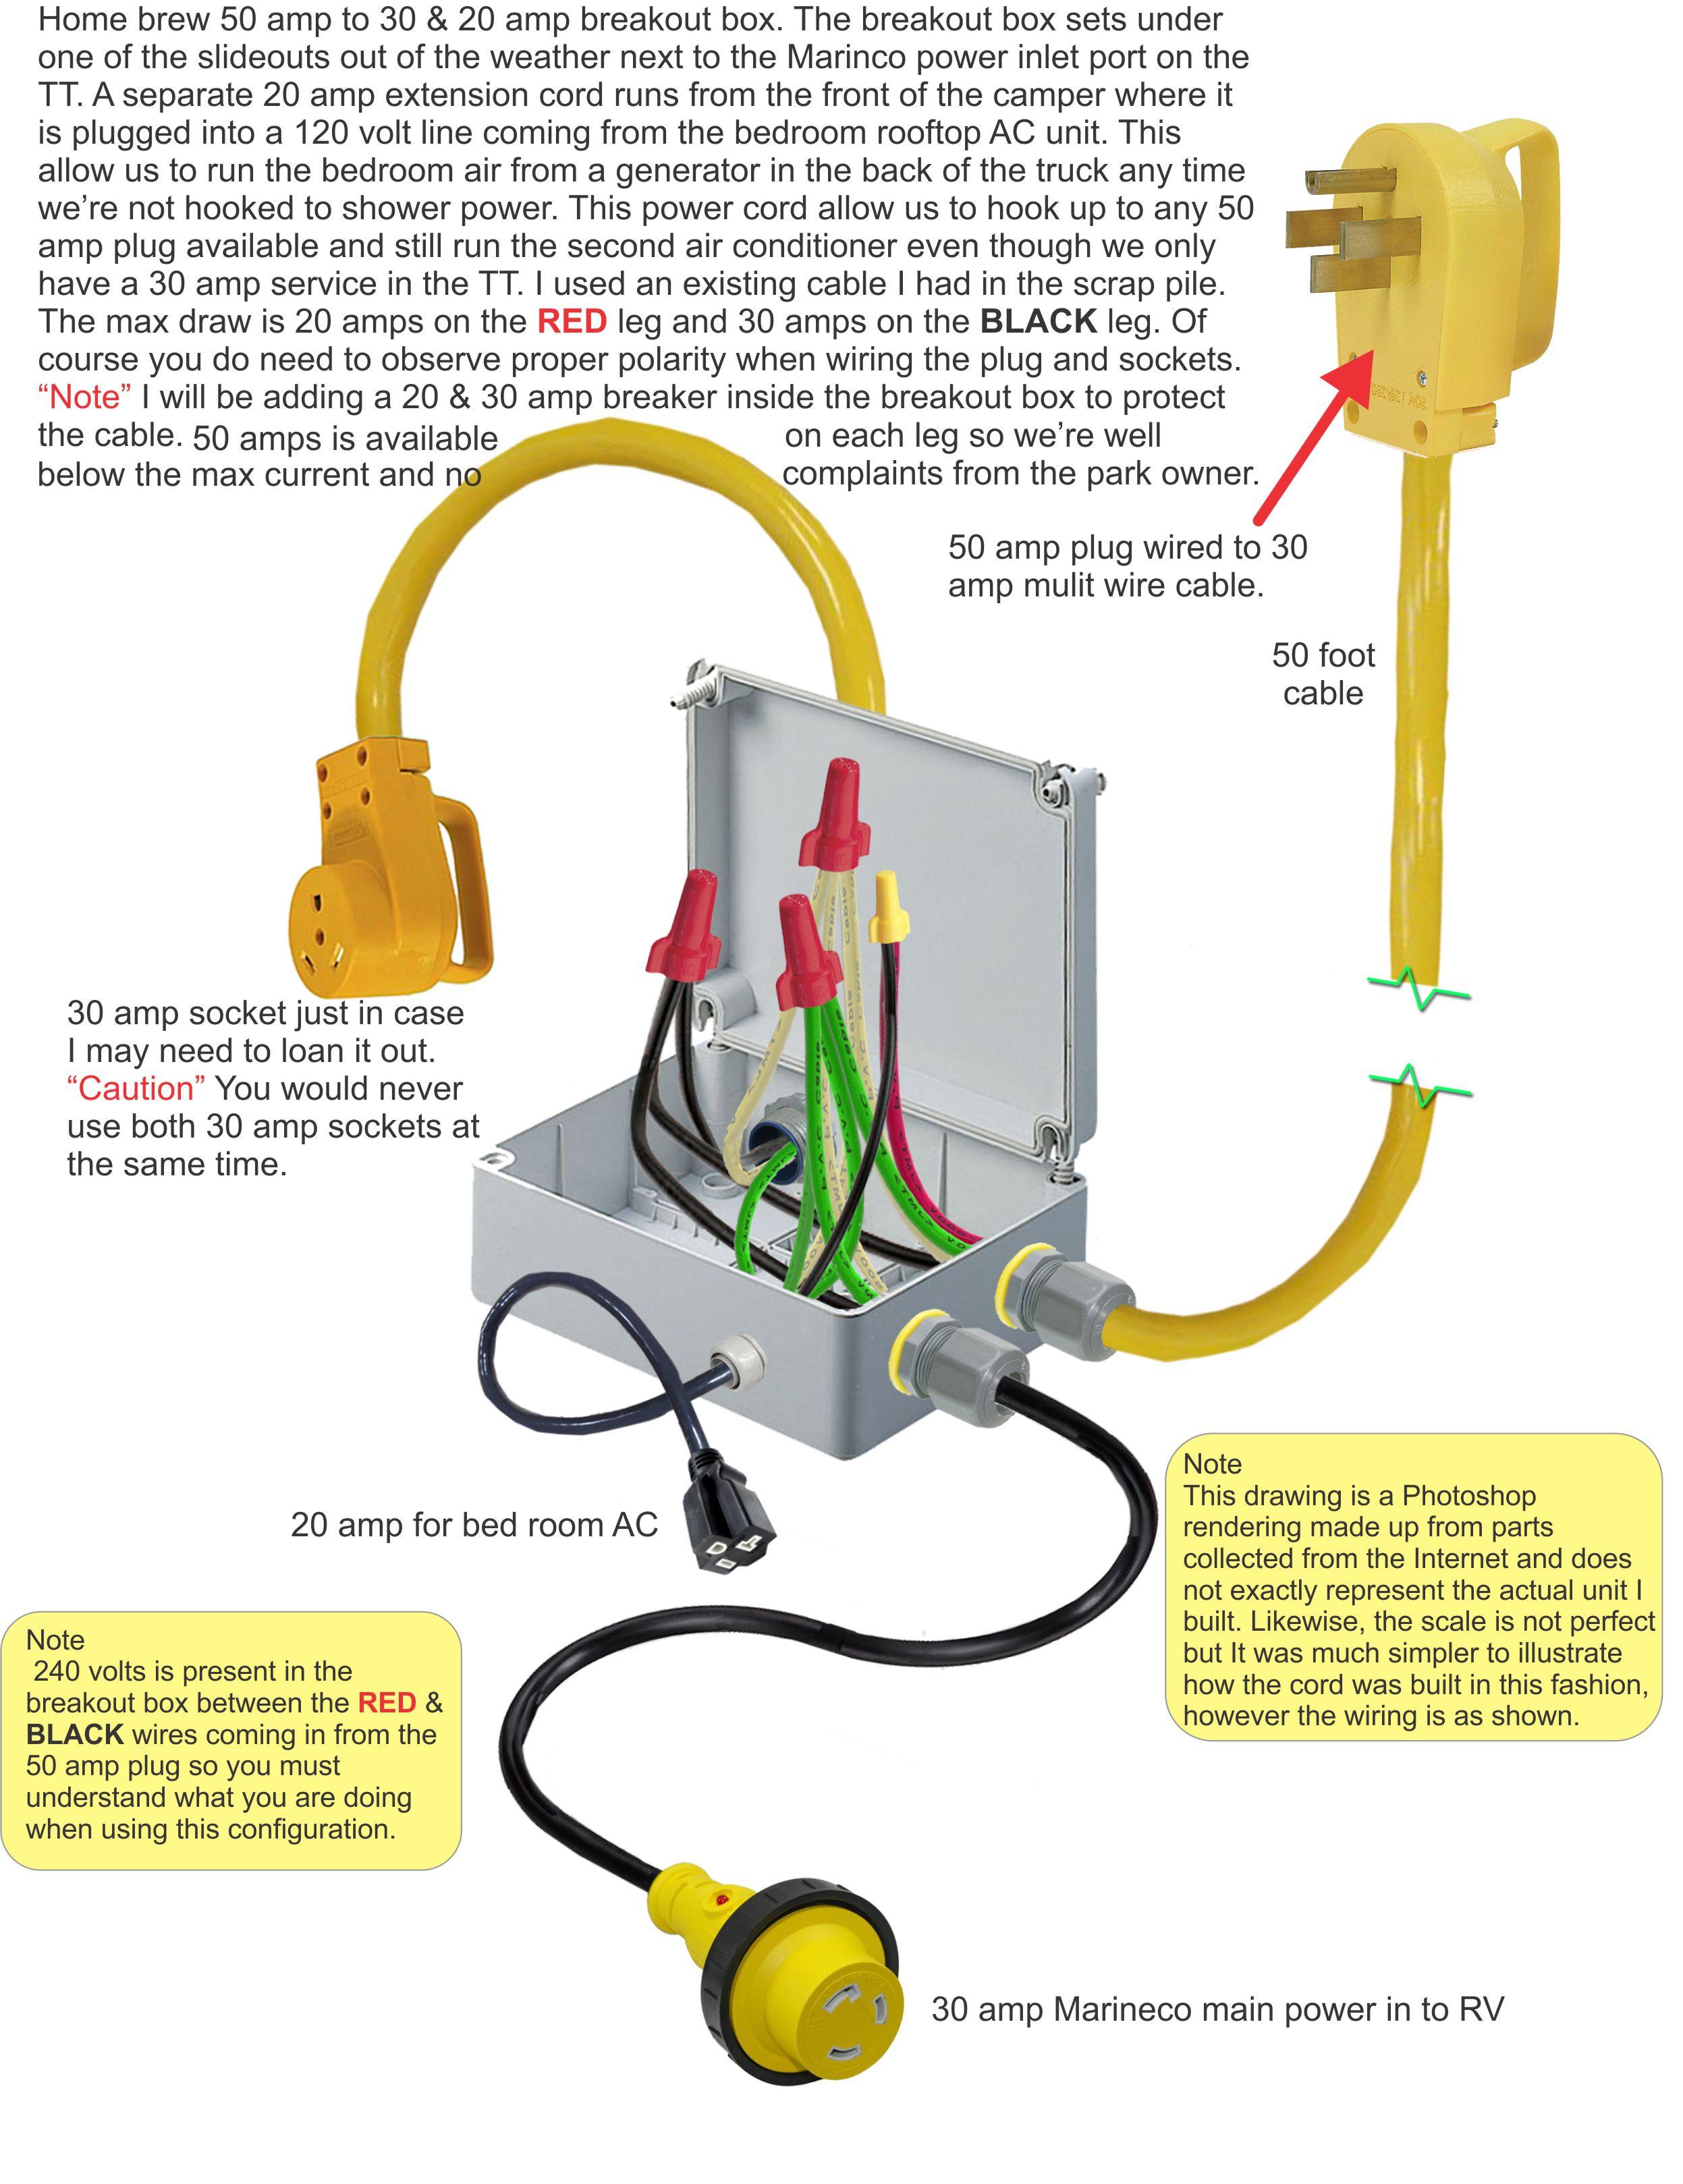 30 Amp Plug Wiring Up A Motorhome | Wiring Diagram - 30 Amp Rv Wiring Diagram